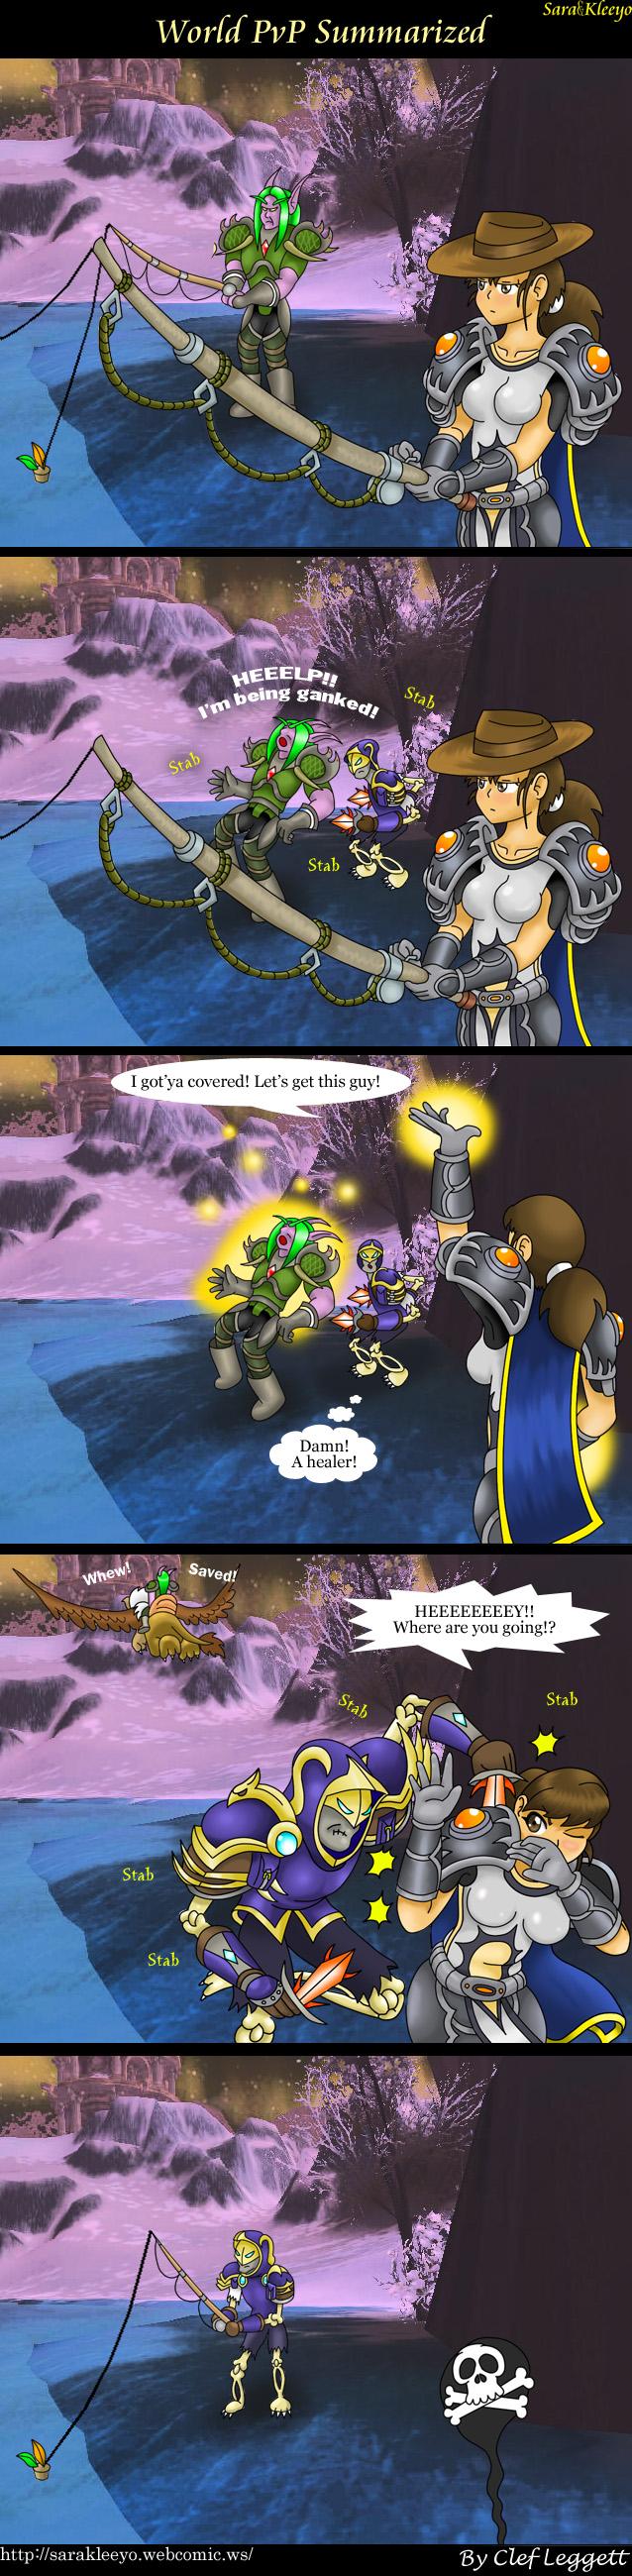 Chorradas Reloaded - Página 11 Comic-2012-06-05-full